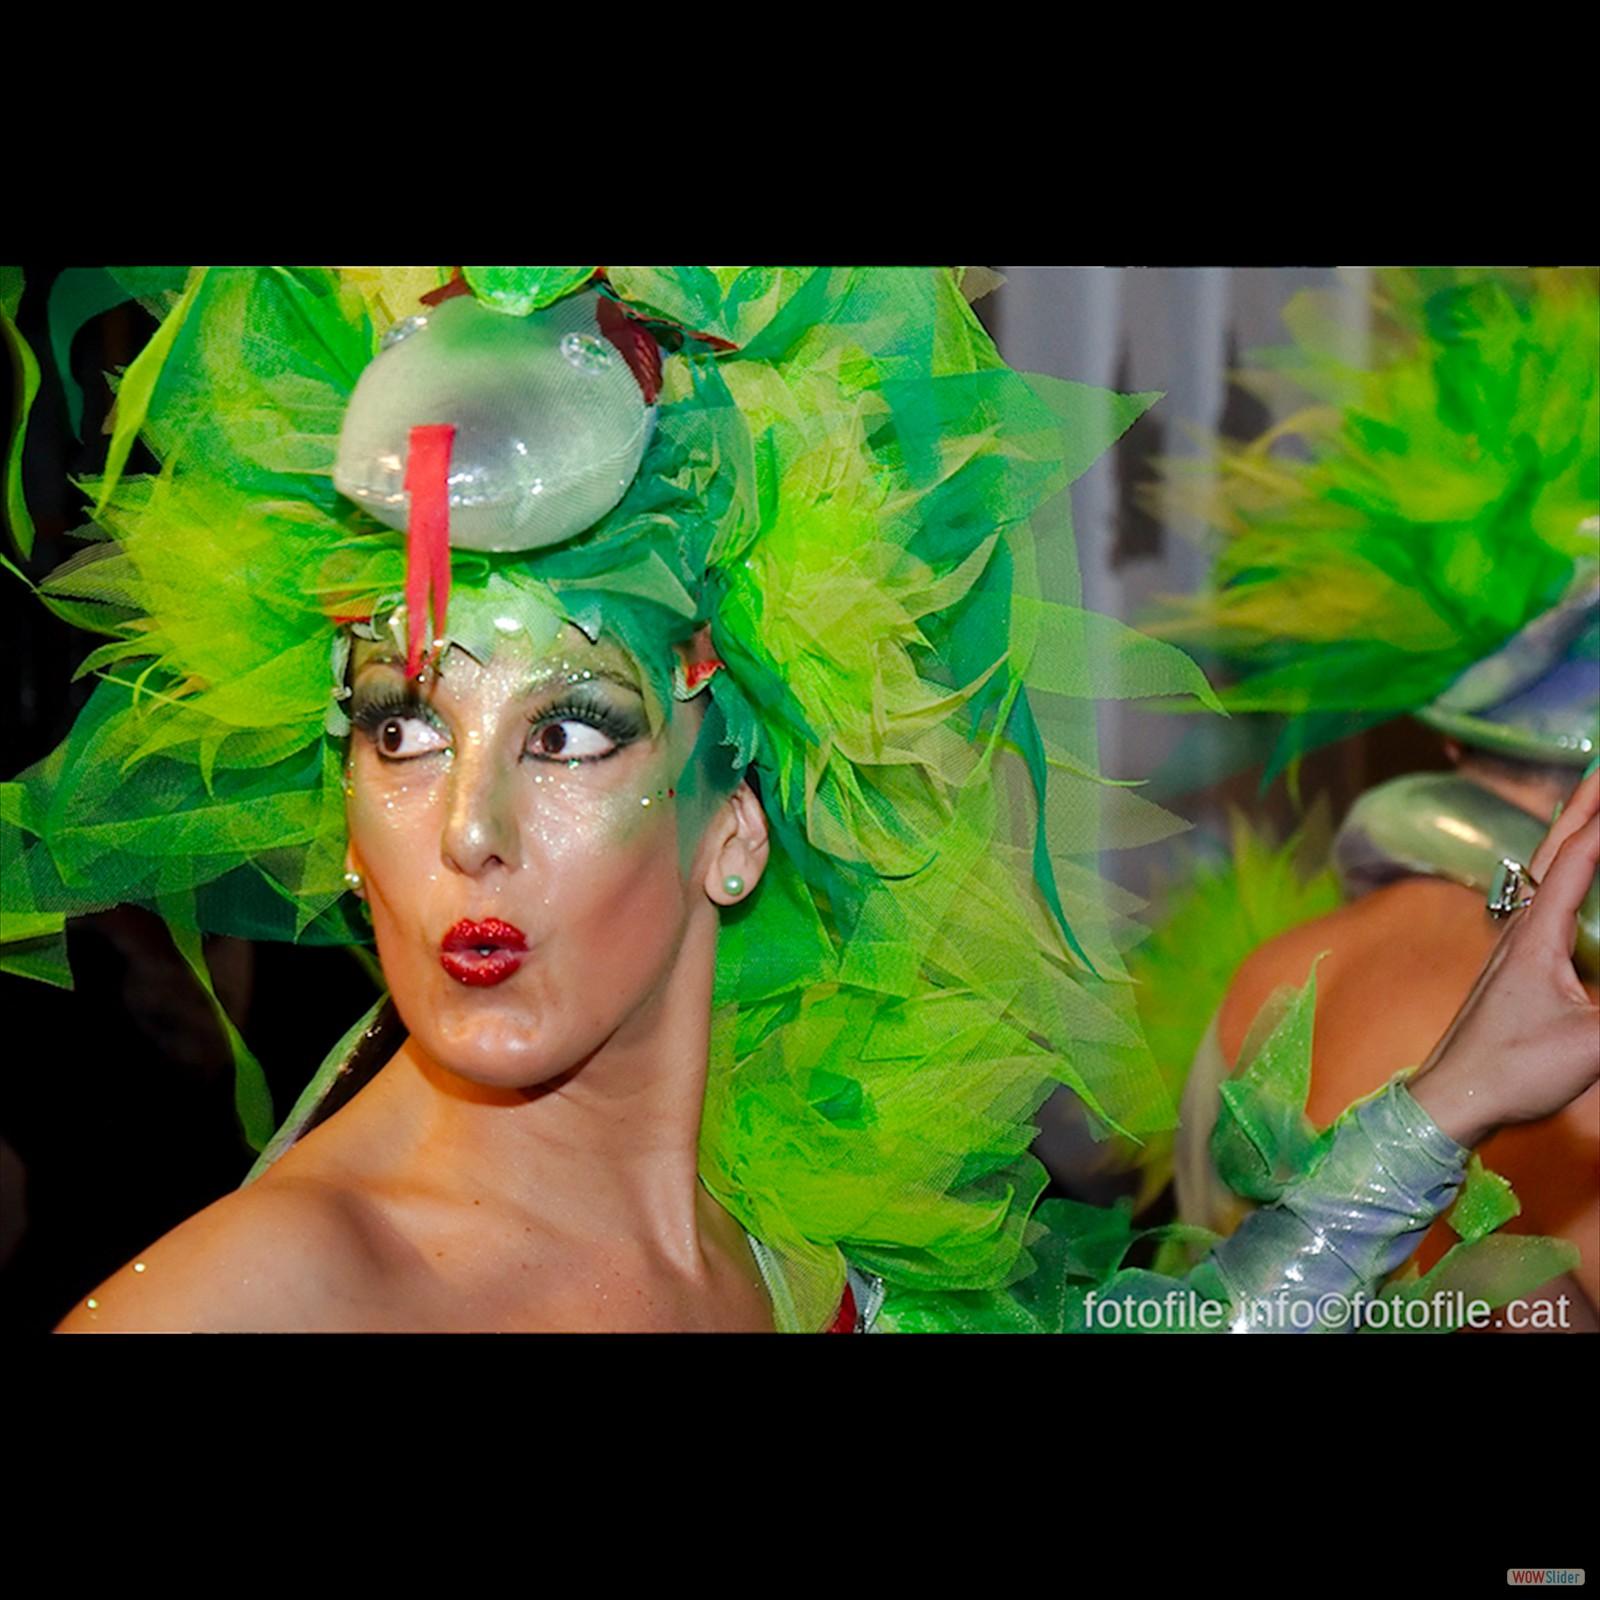 CarnavalSitges2013_04027_v2